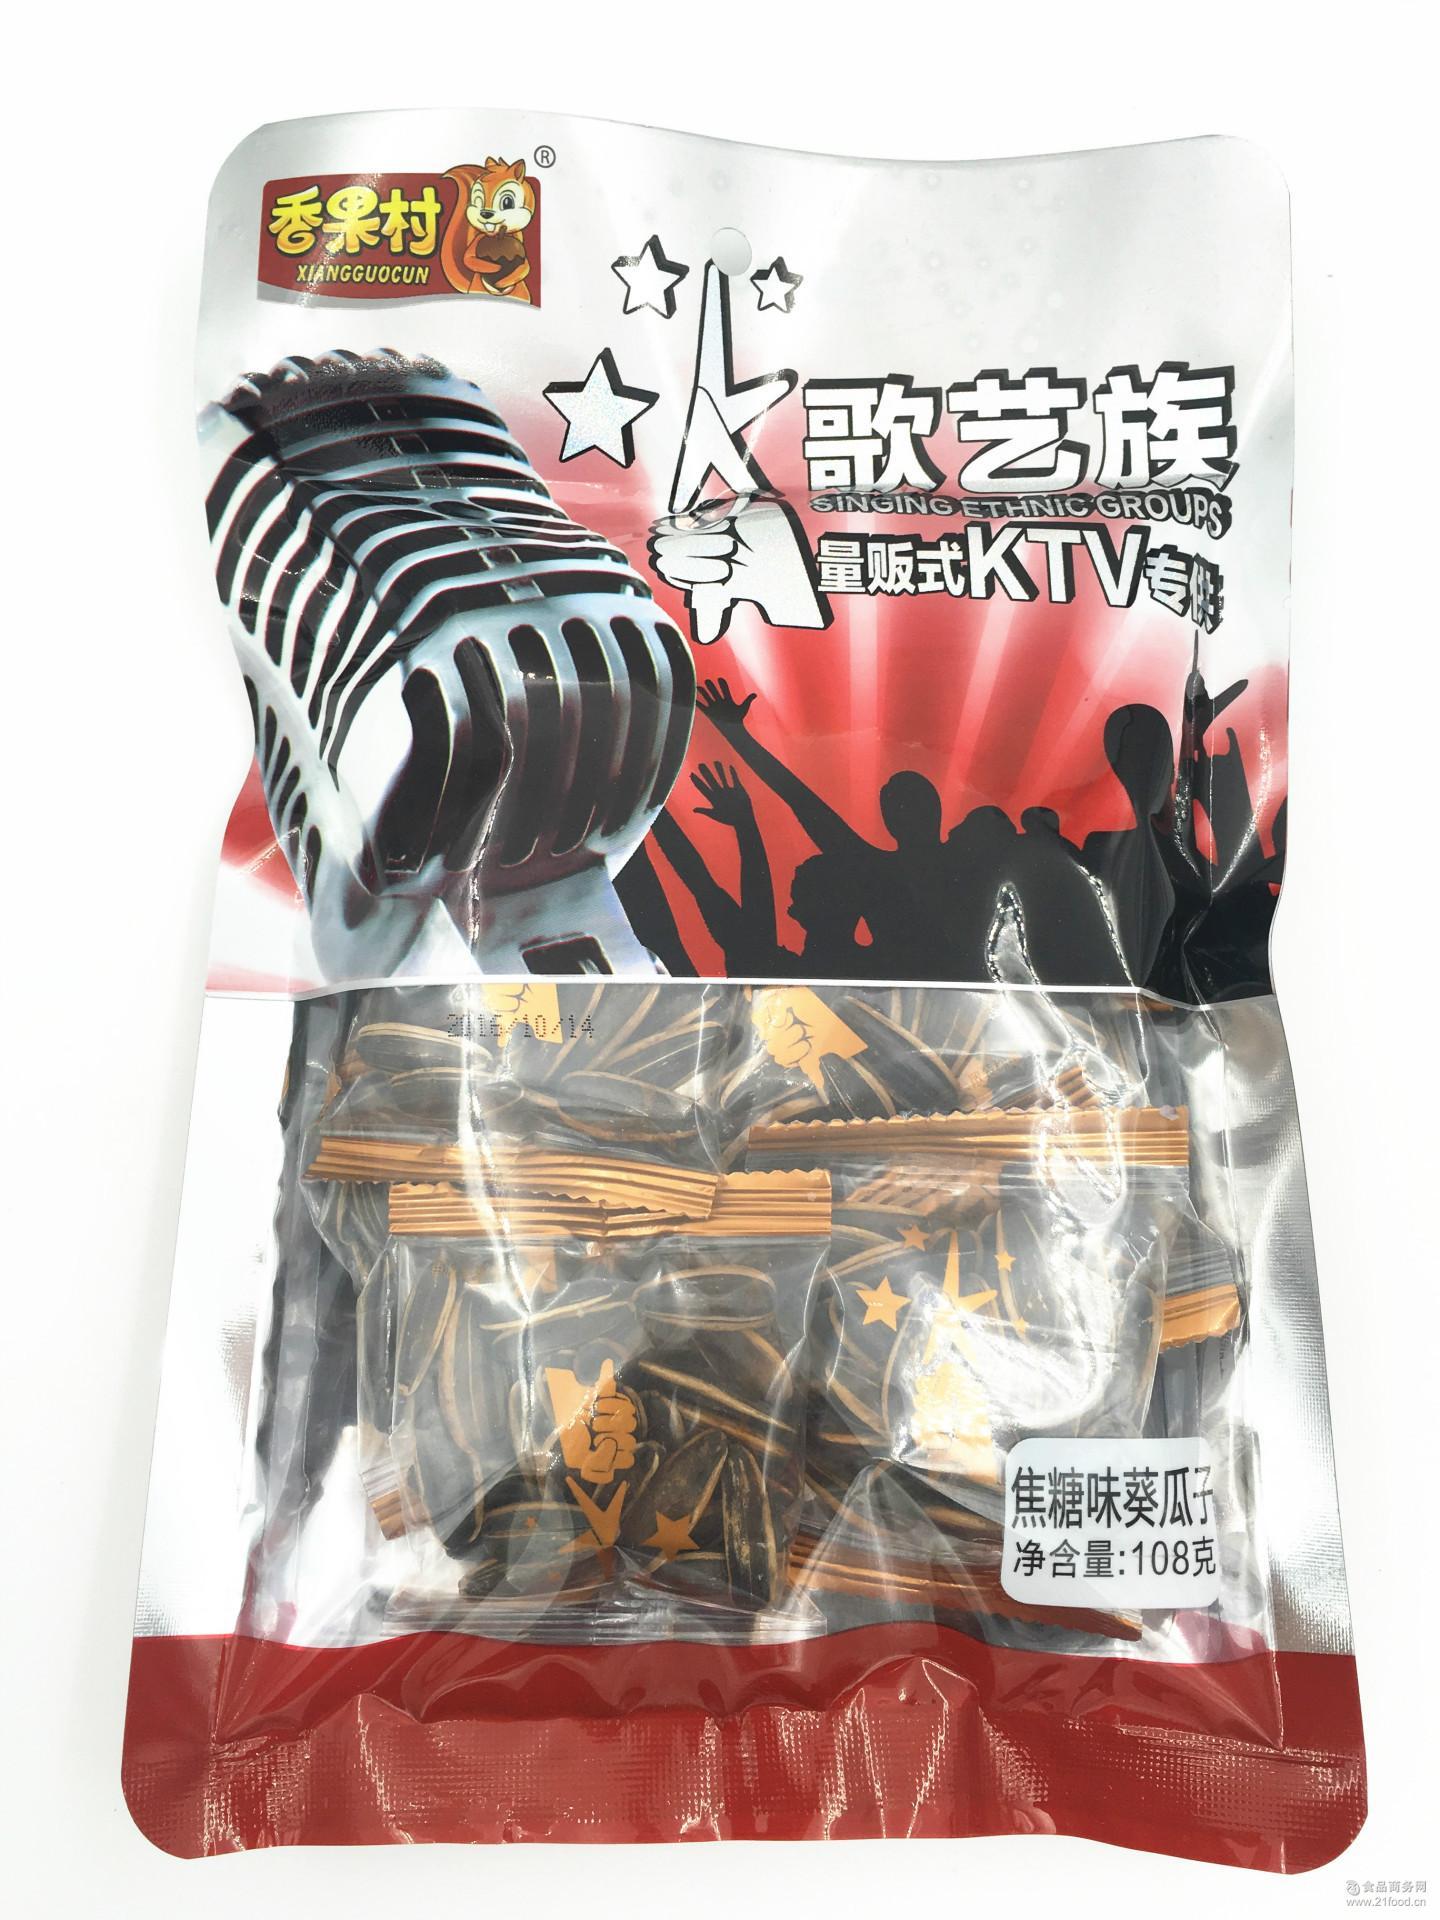 K歌艺族108g焦糖味葵瓜子 炒货 夜场 零食 年货 量版式KTV*